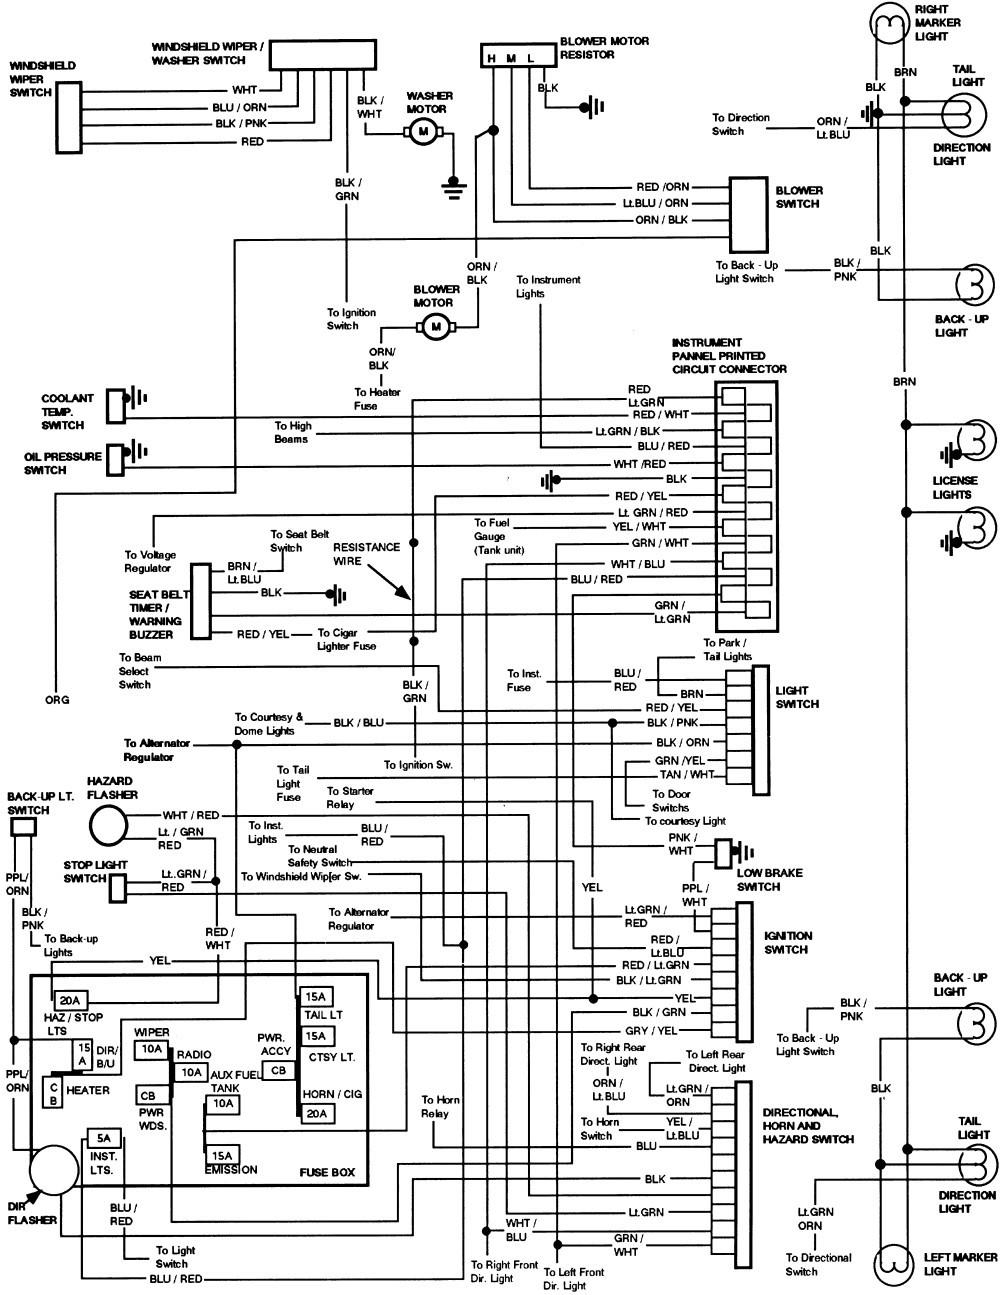 1999 Ford F 250 Alternator Wiring Wiring Diagram Paper 1999 Ford F250 Alternator Wiring 1999 Ford F250 Alternator Wiring